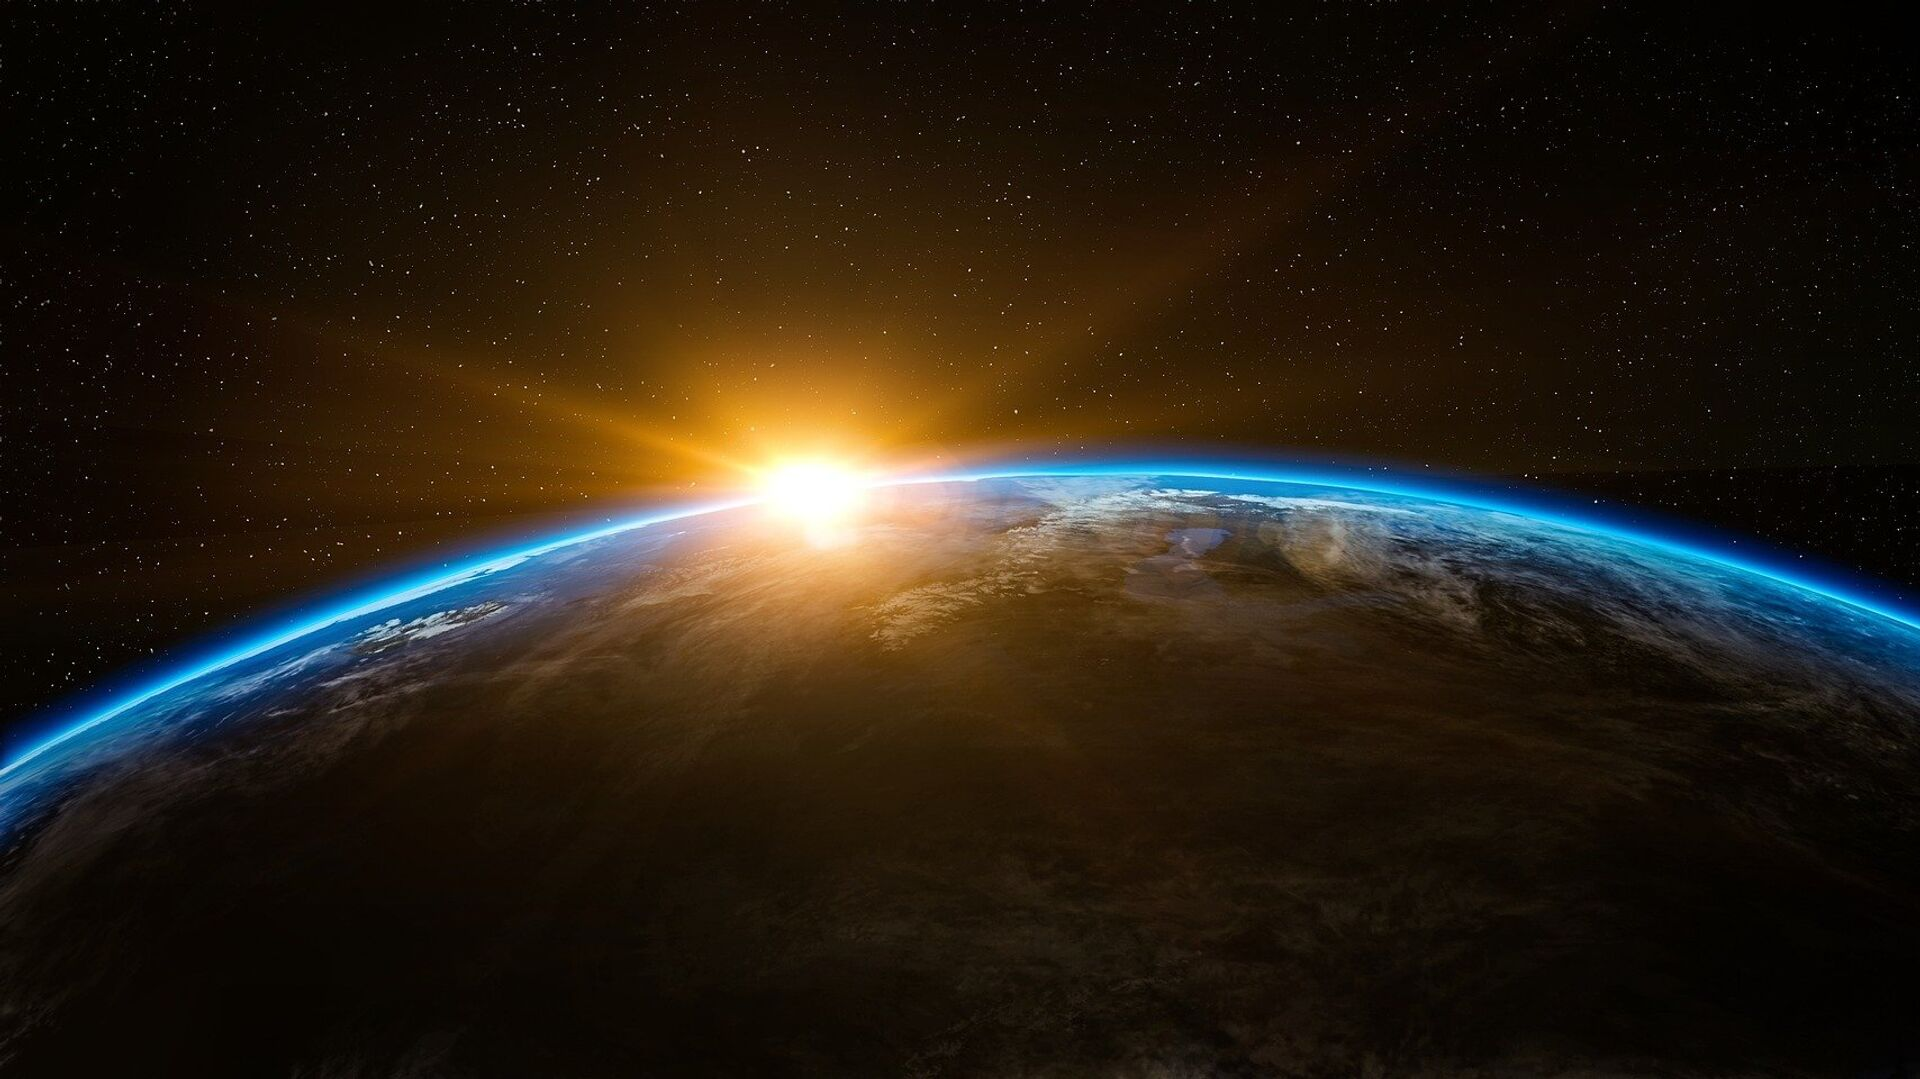 Sunrise in outer space - Sputnik International, 1920, 13.09.2021